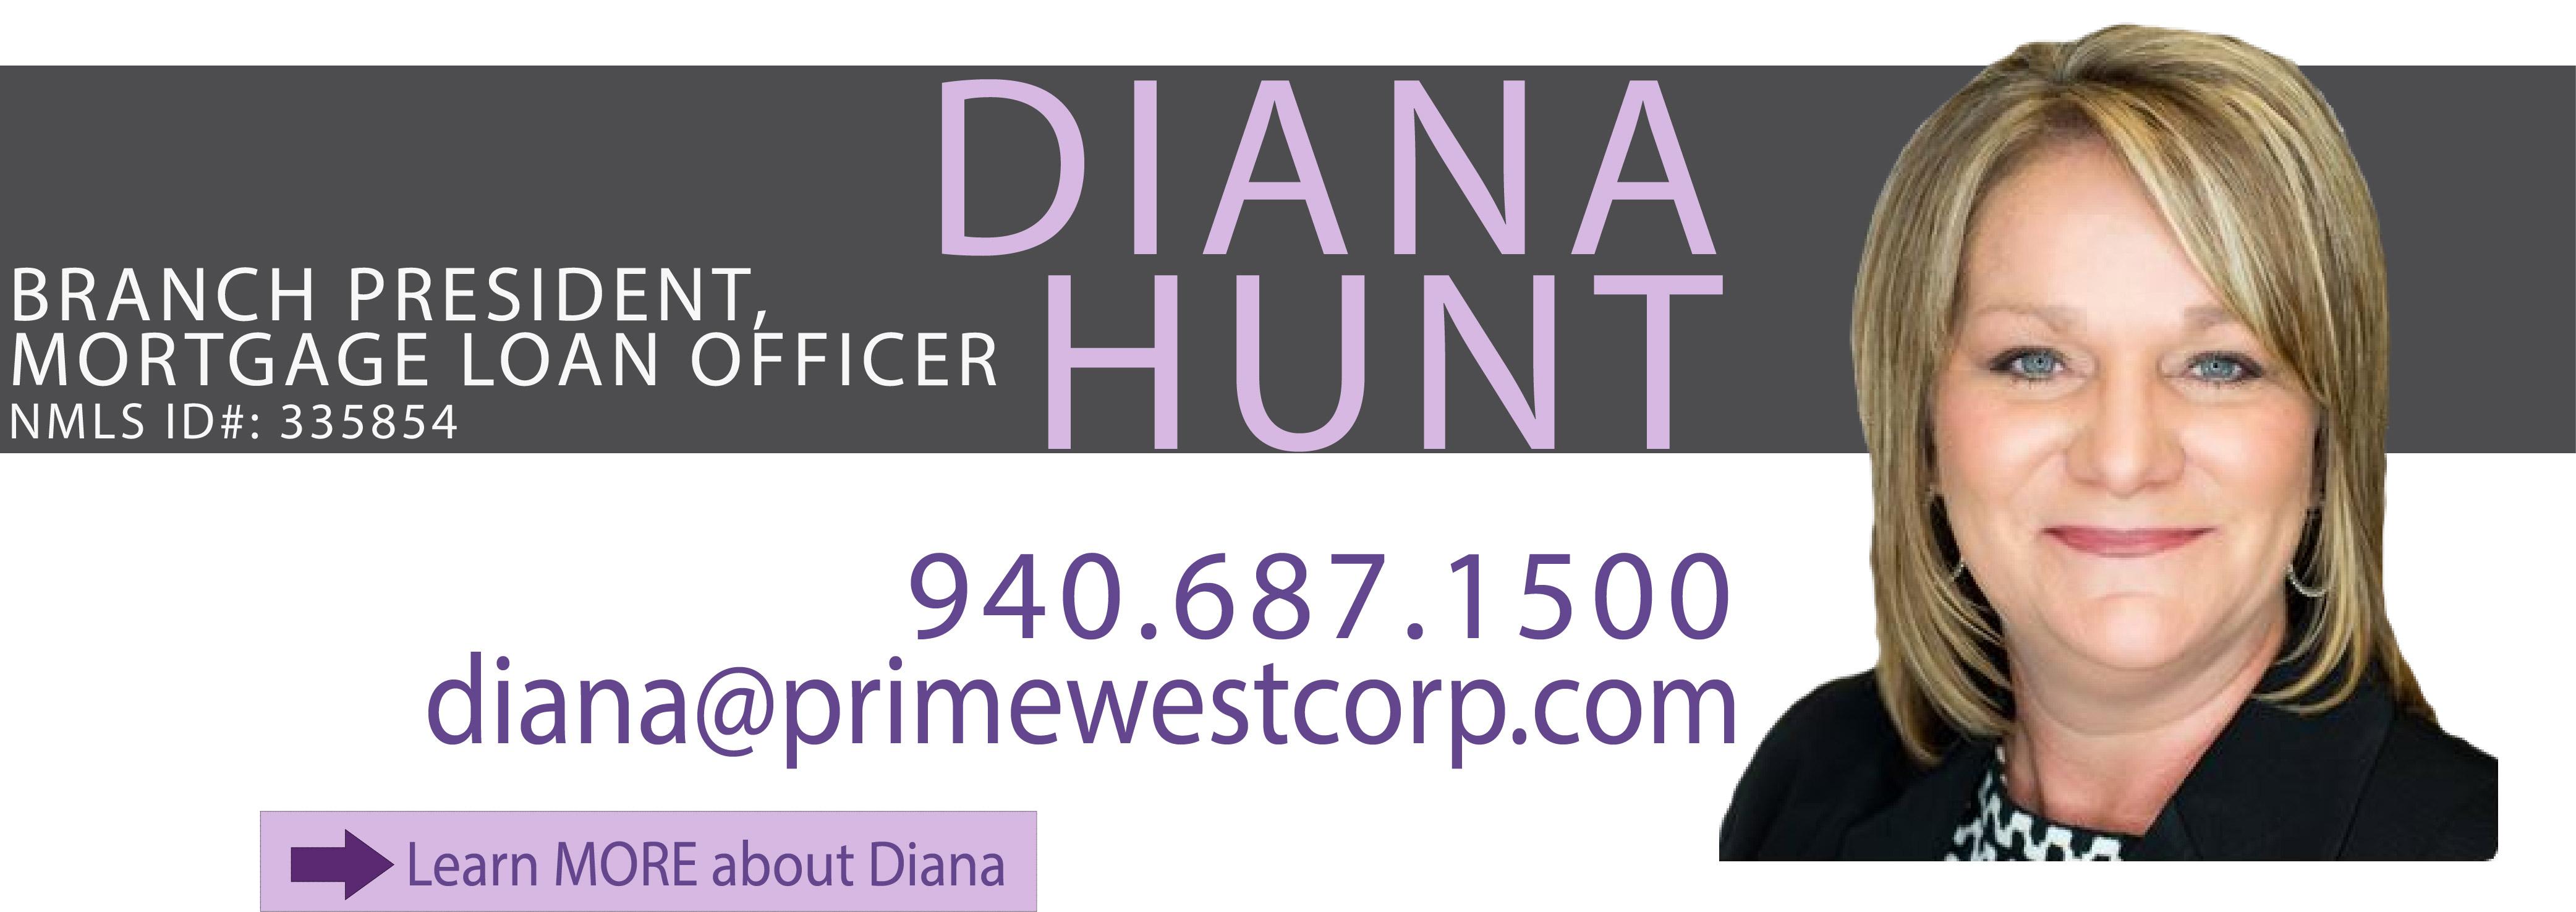 Diana Hunt, VP, Mortgage Loan Officer in Wichita Falls, Texas